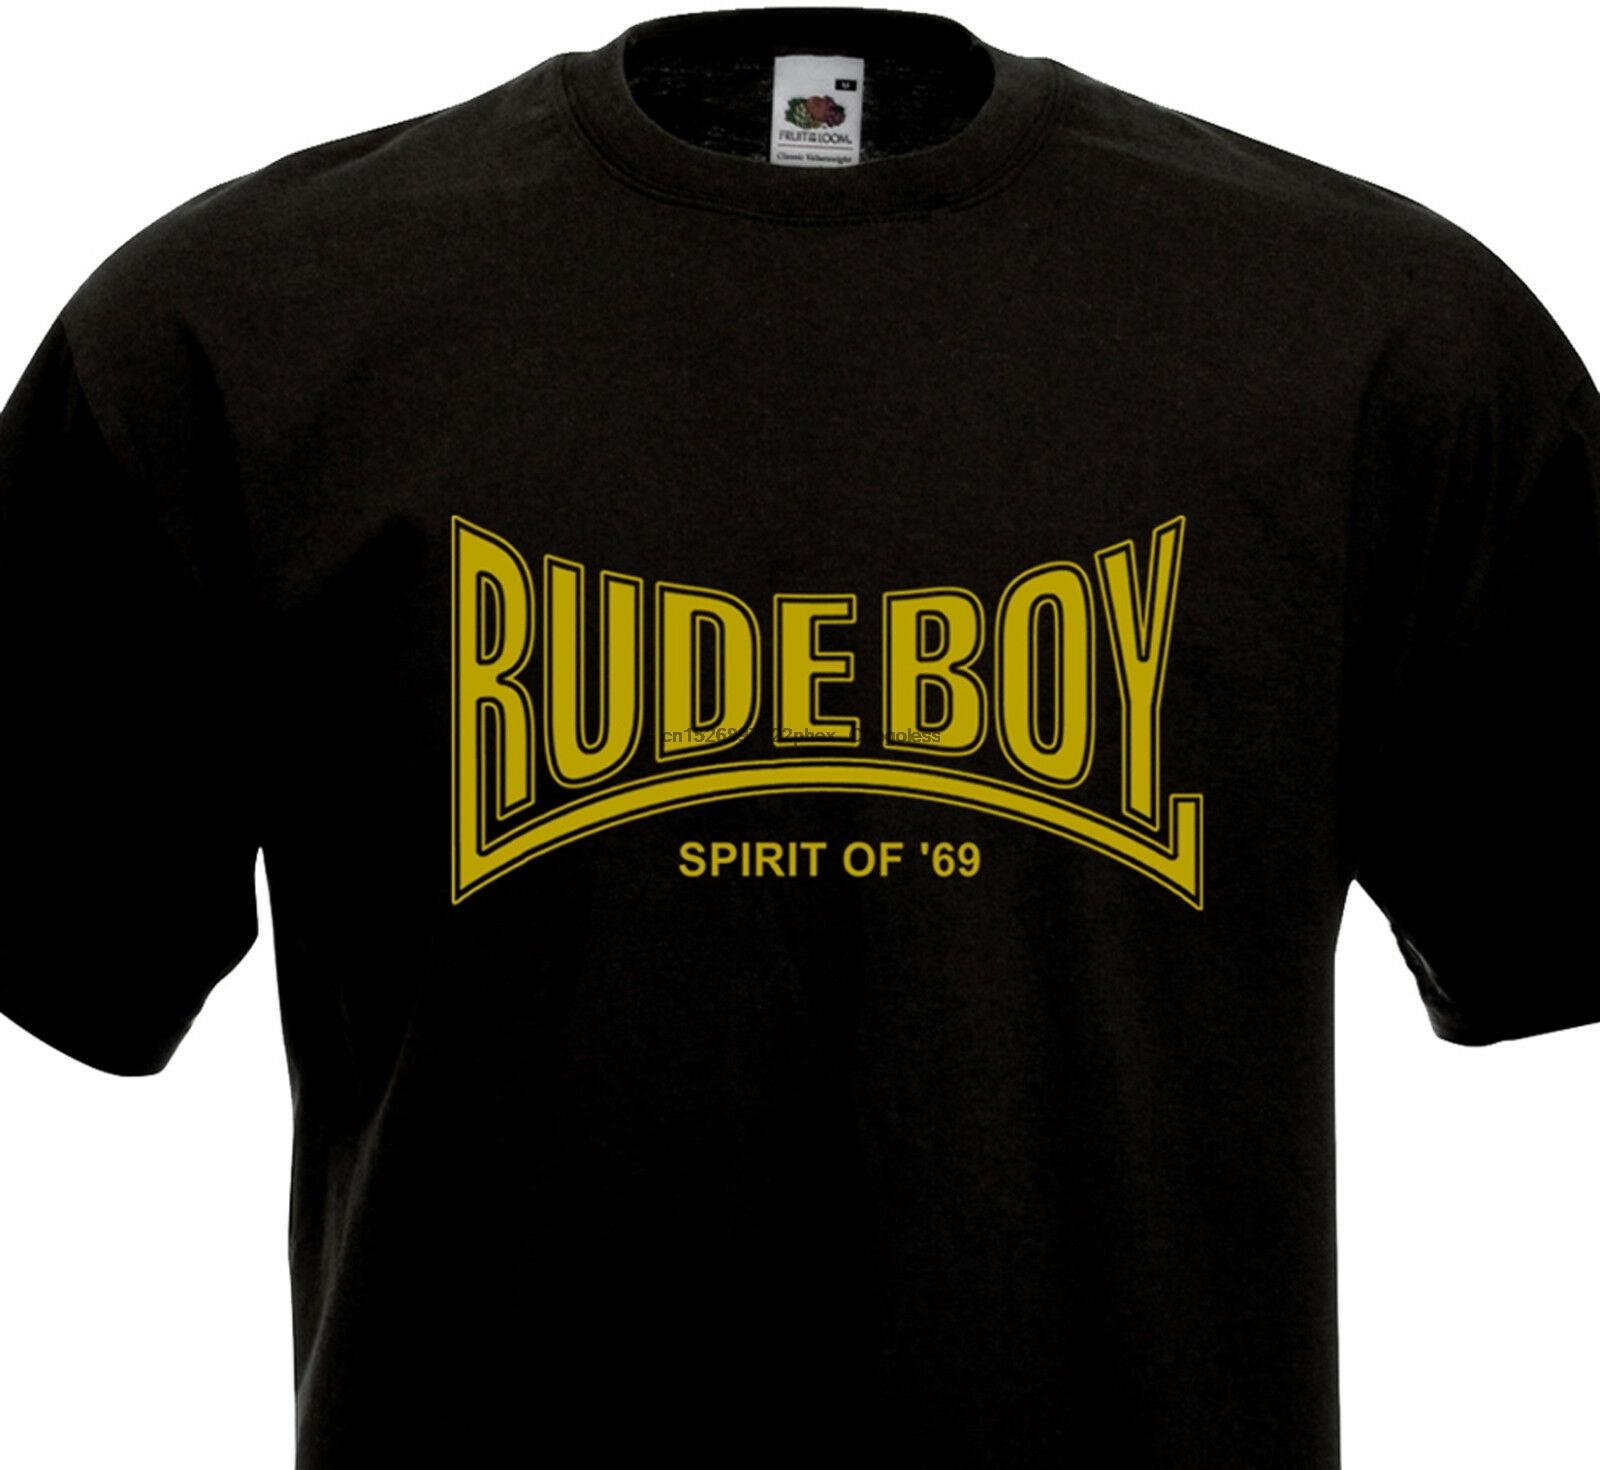 Camiseta rude menino espírito of69 69-ska trojan rocksteady punk rock pele inglaterra (1)